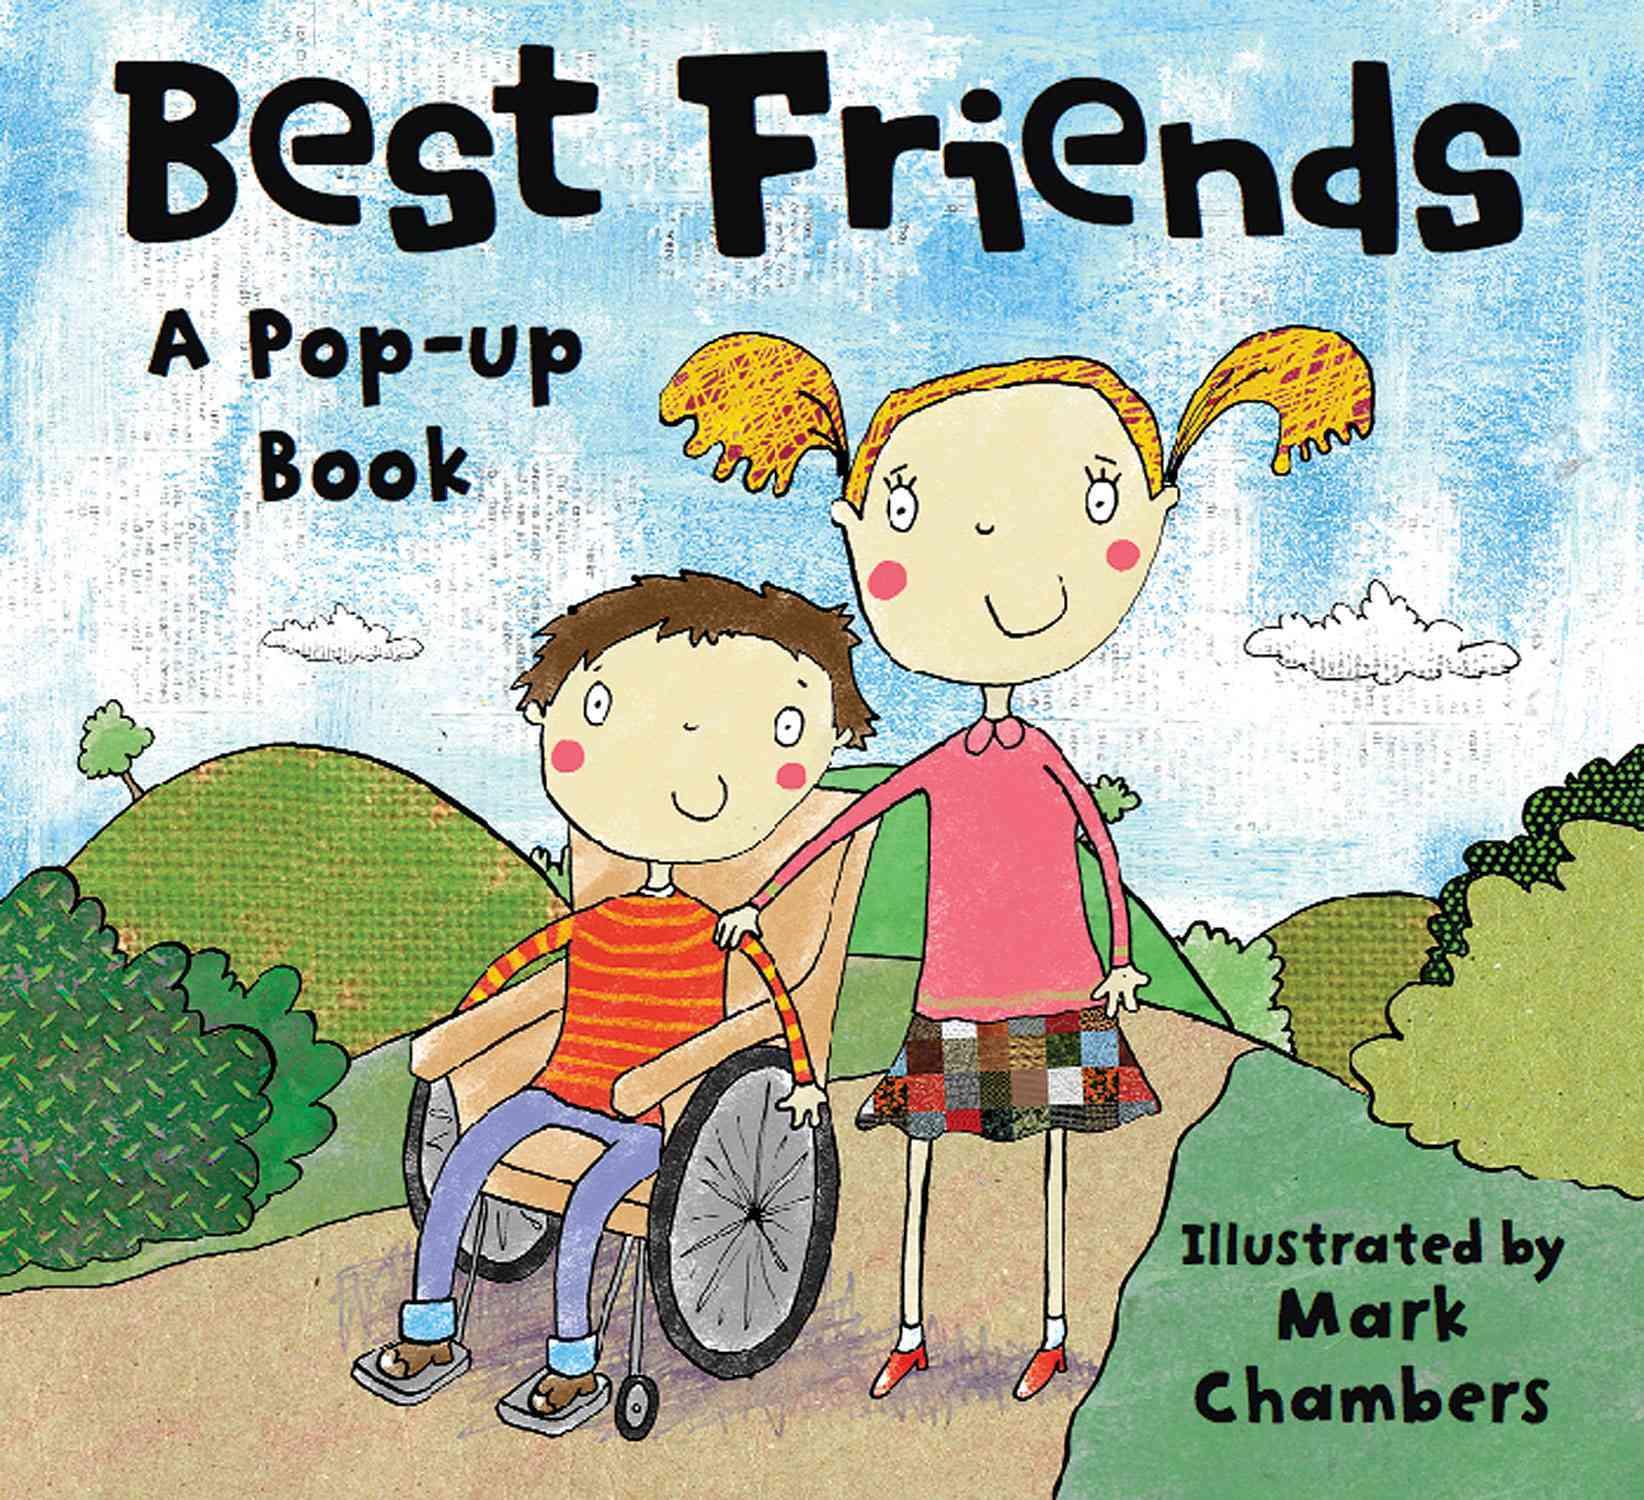 Best Friends: A Pop-up Book (Hardcover)